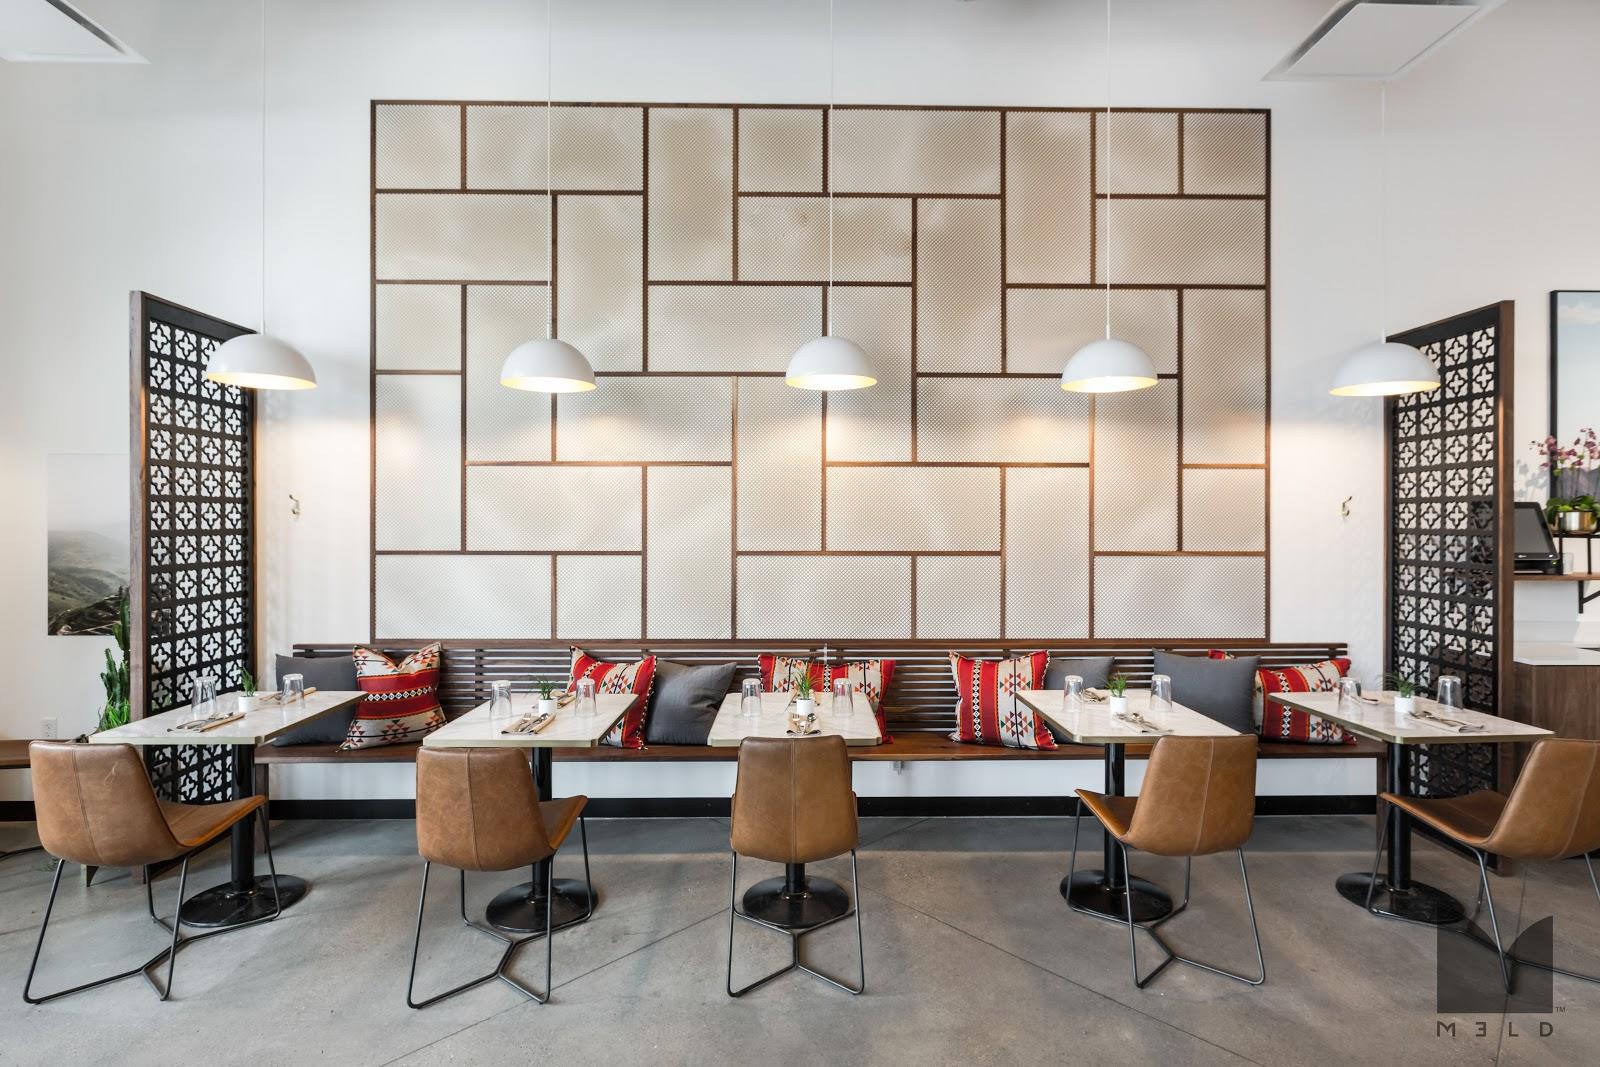 M3LD Laziz Kitchen Design Project.jpg